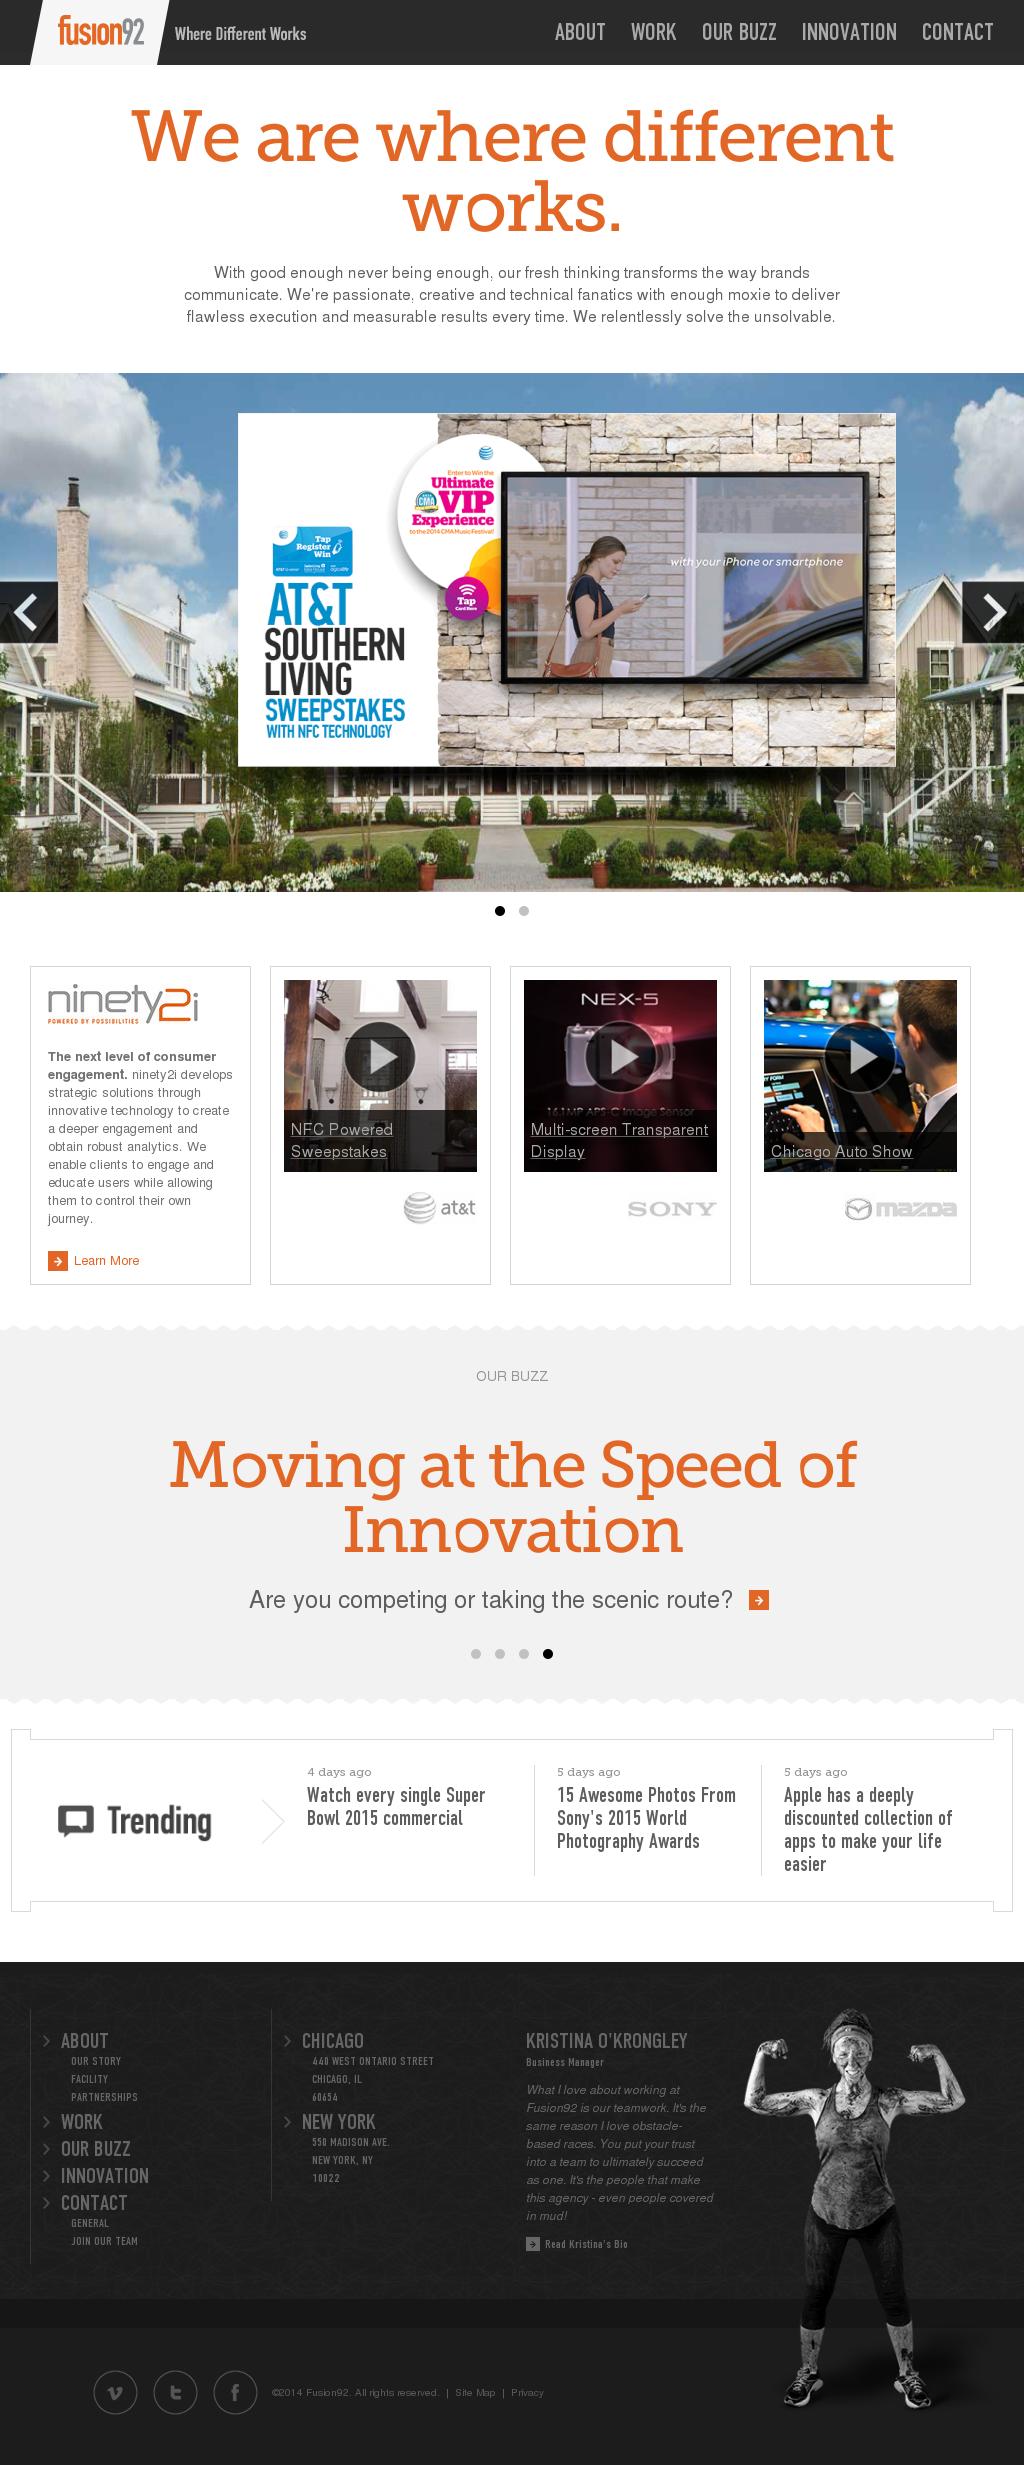 Fusion92 Competitors, Revenue and Employees - Owler Company Profile